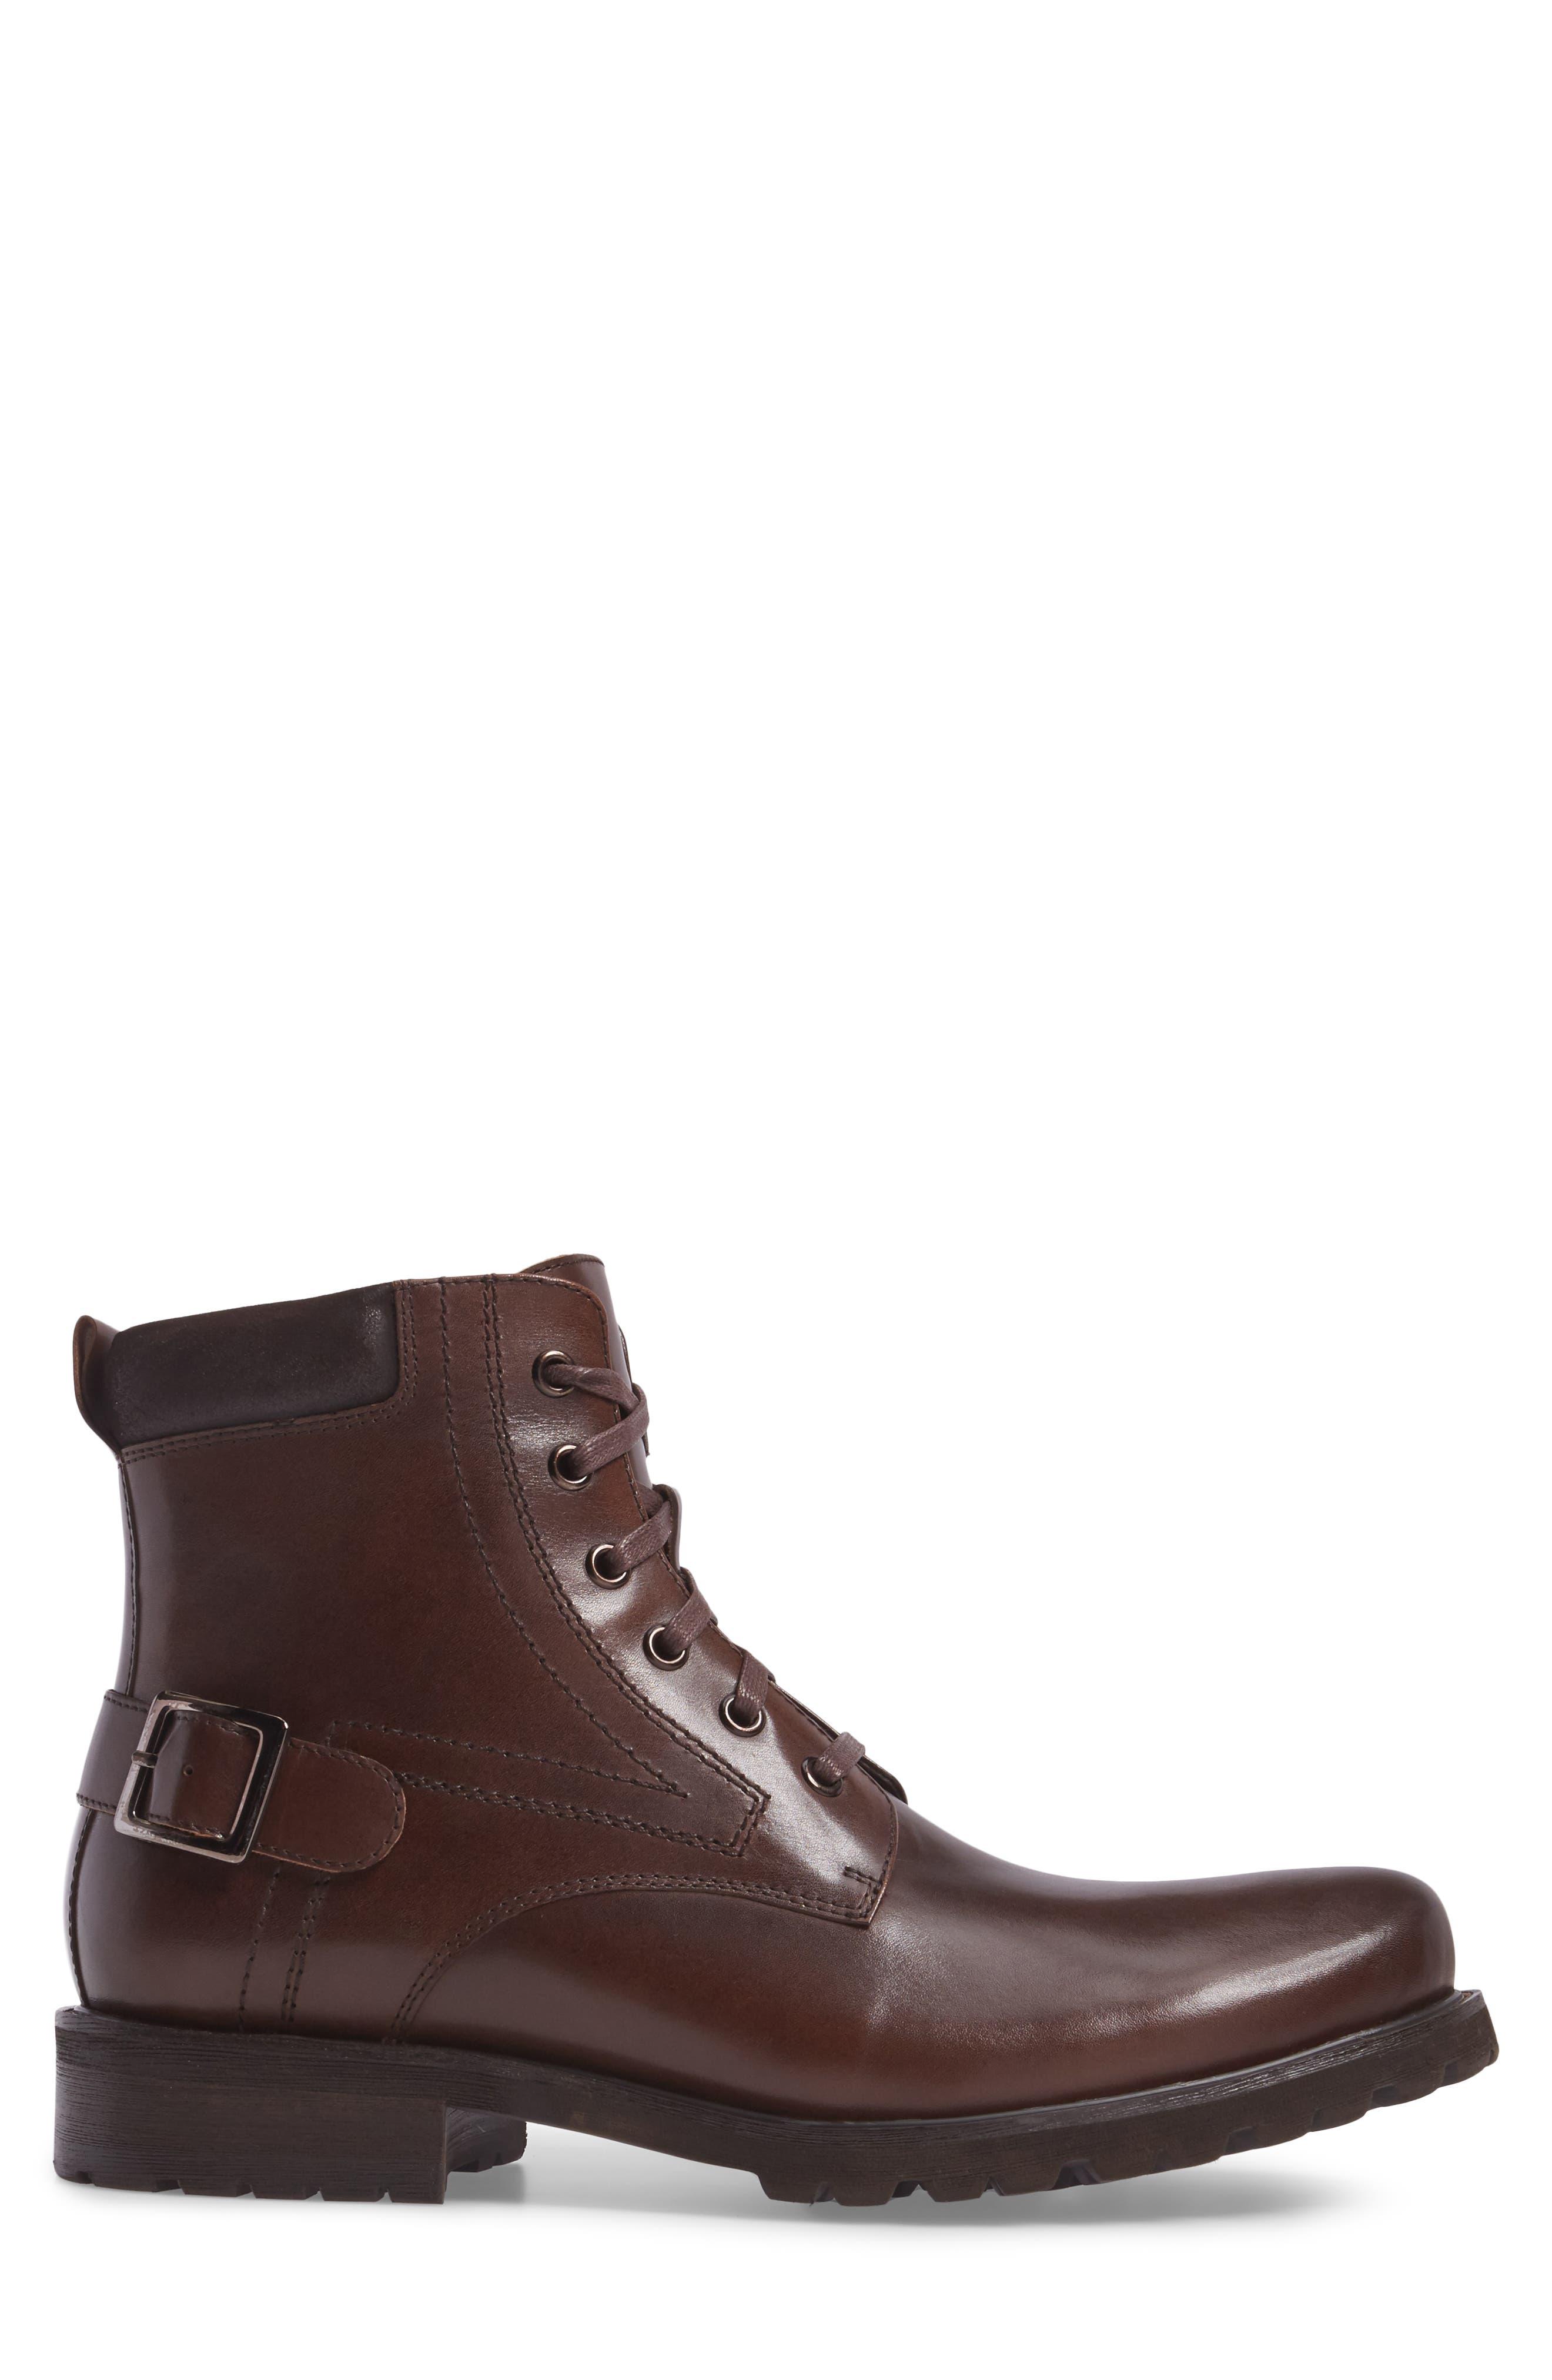 Keller Plain Toe Boot,                             Alternate thumbnail 3, color,                             Brown Leather